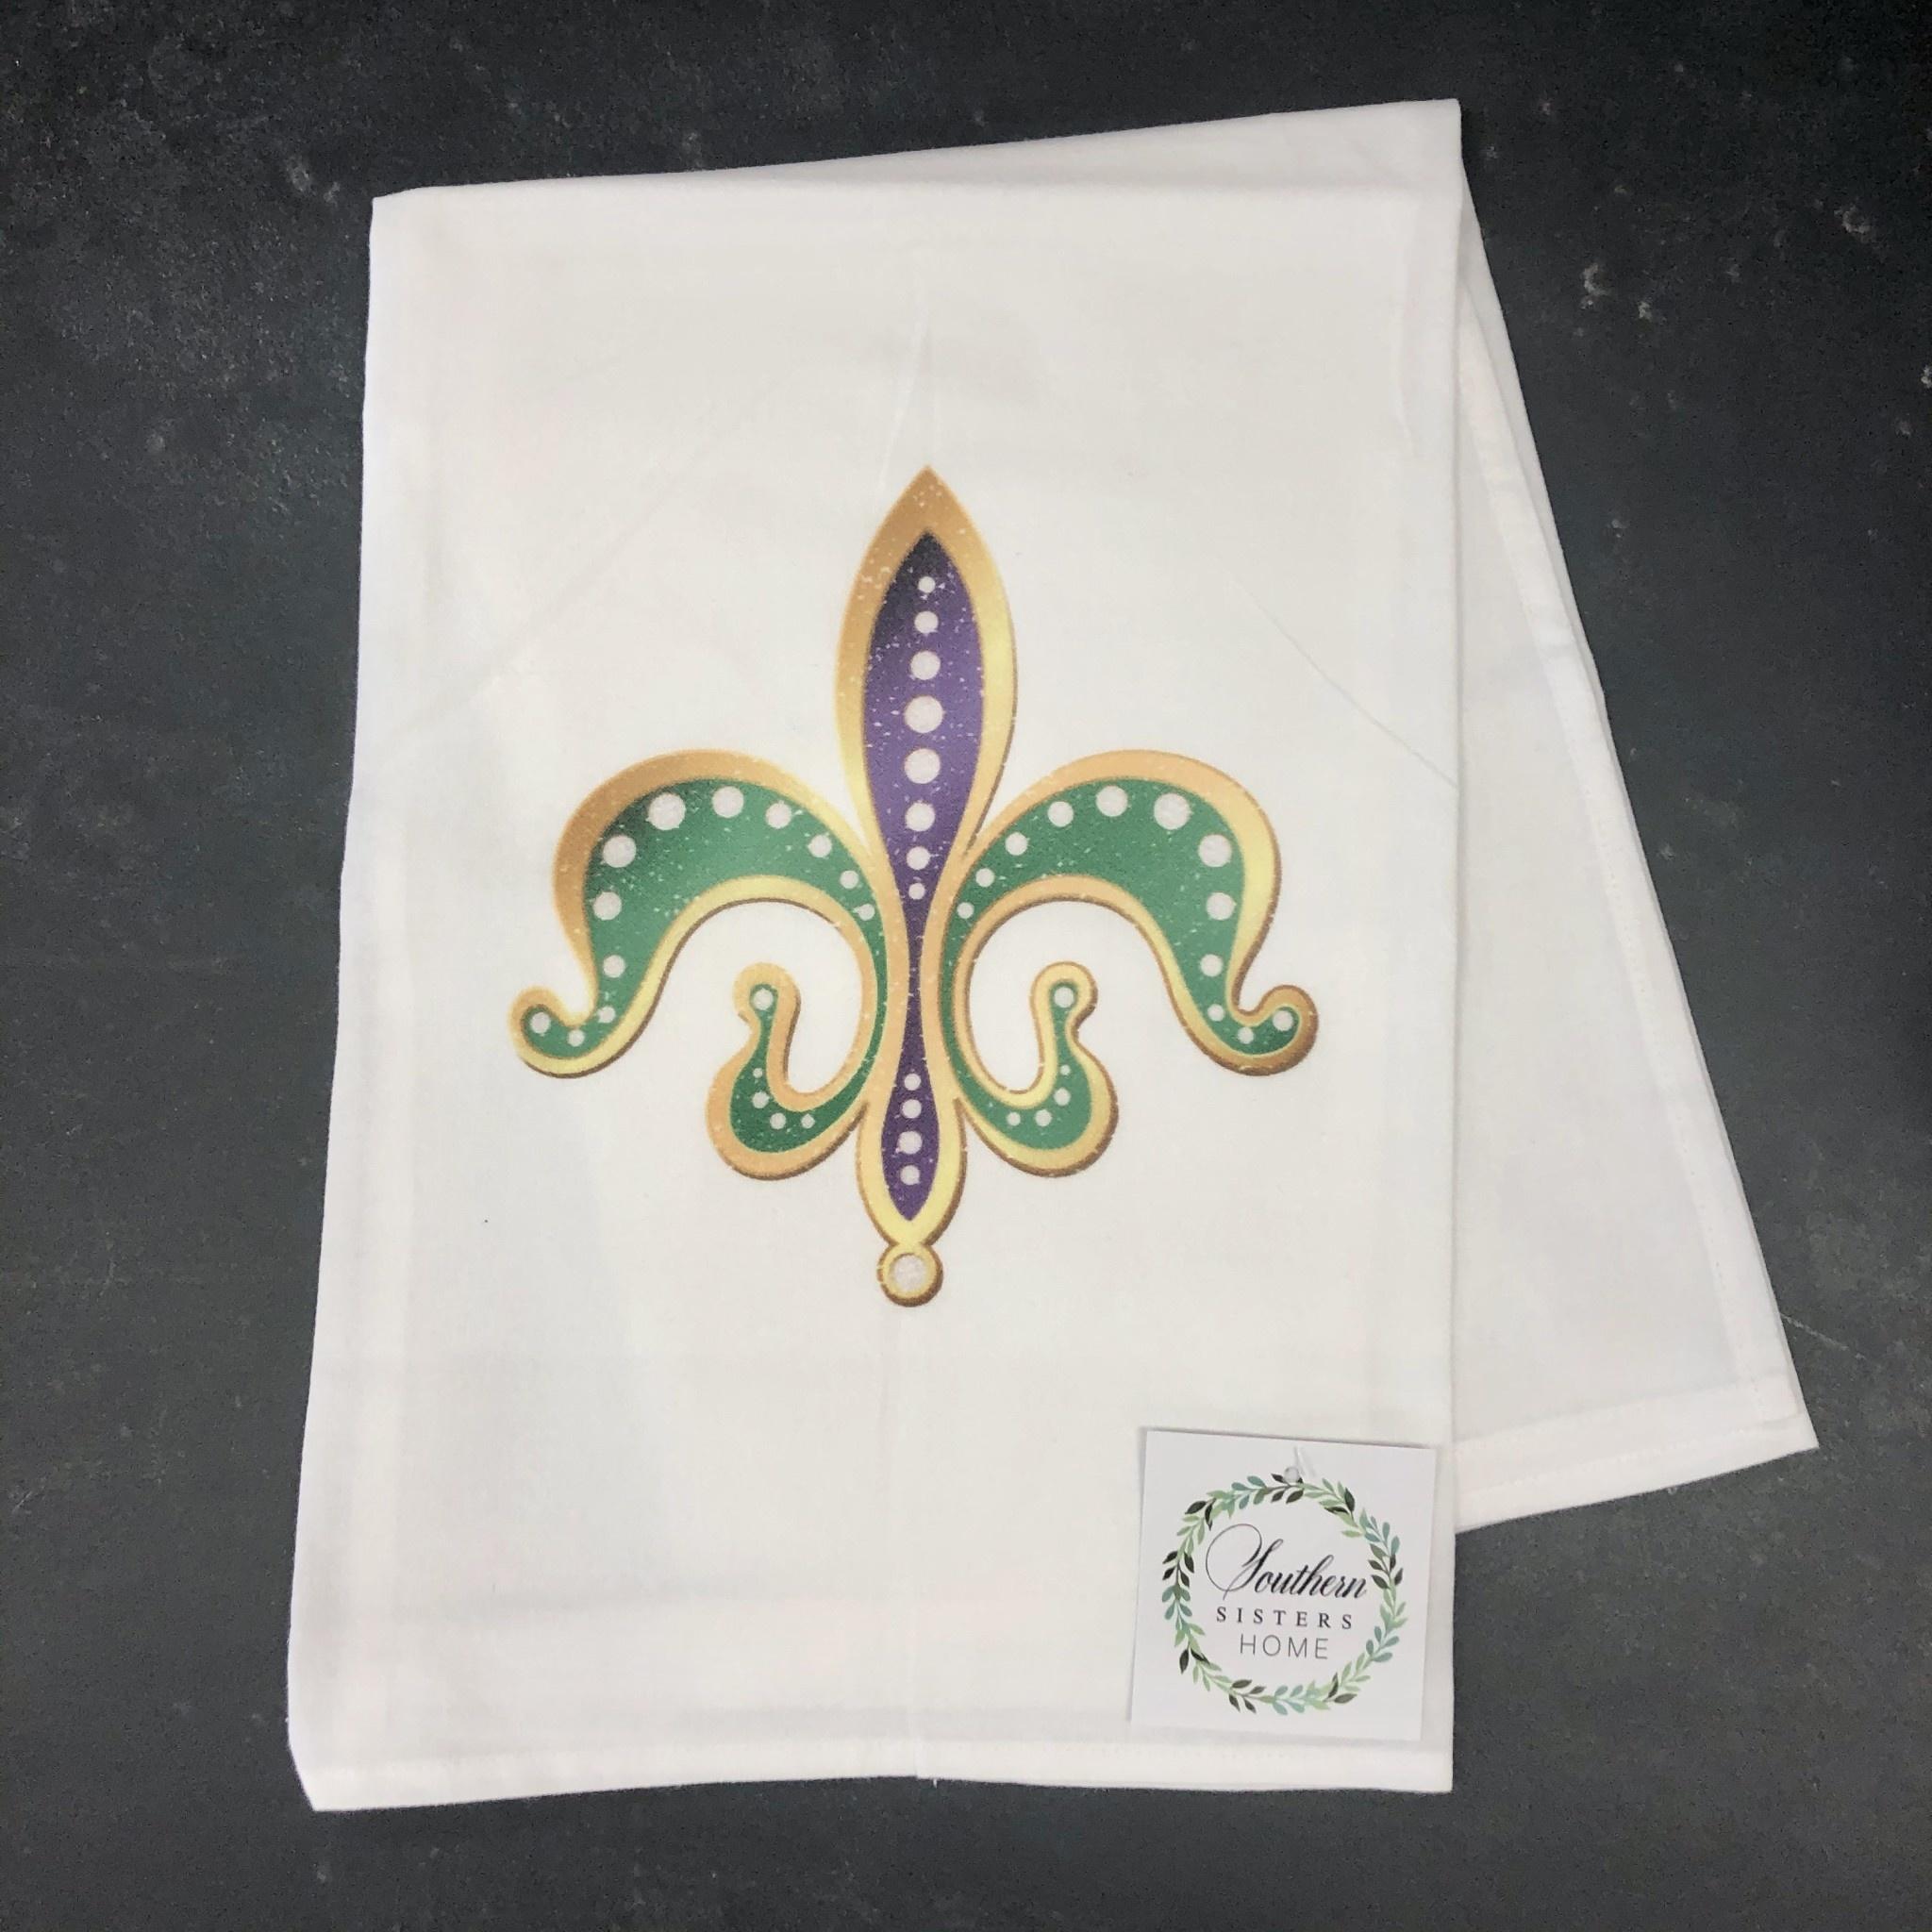 Southern Sisters Enterprises Mardi Gras Fleur de Lis Towel